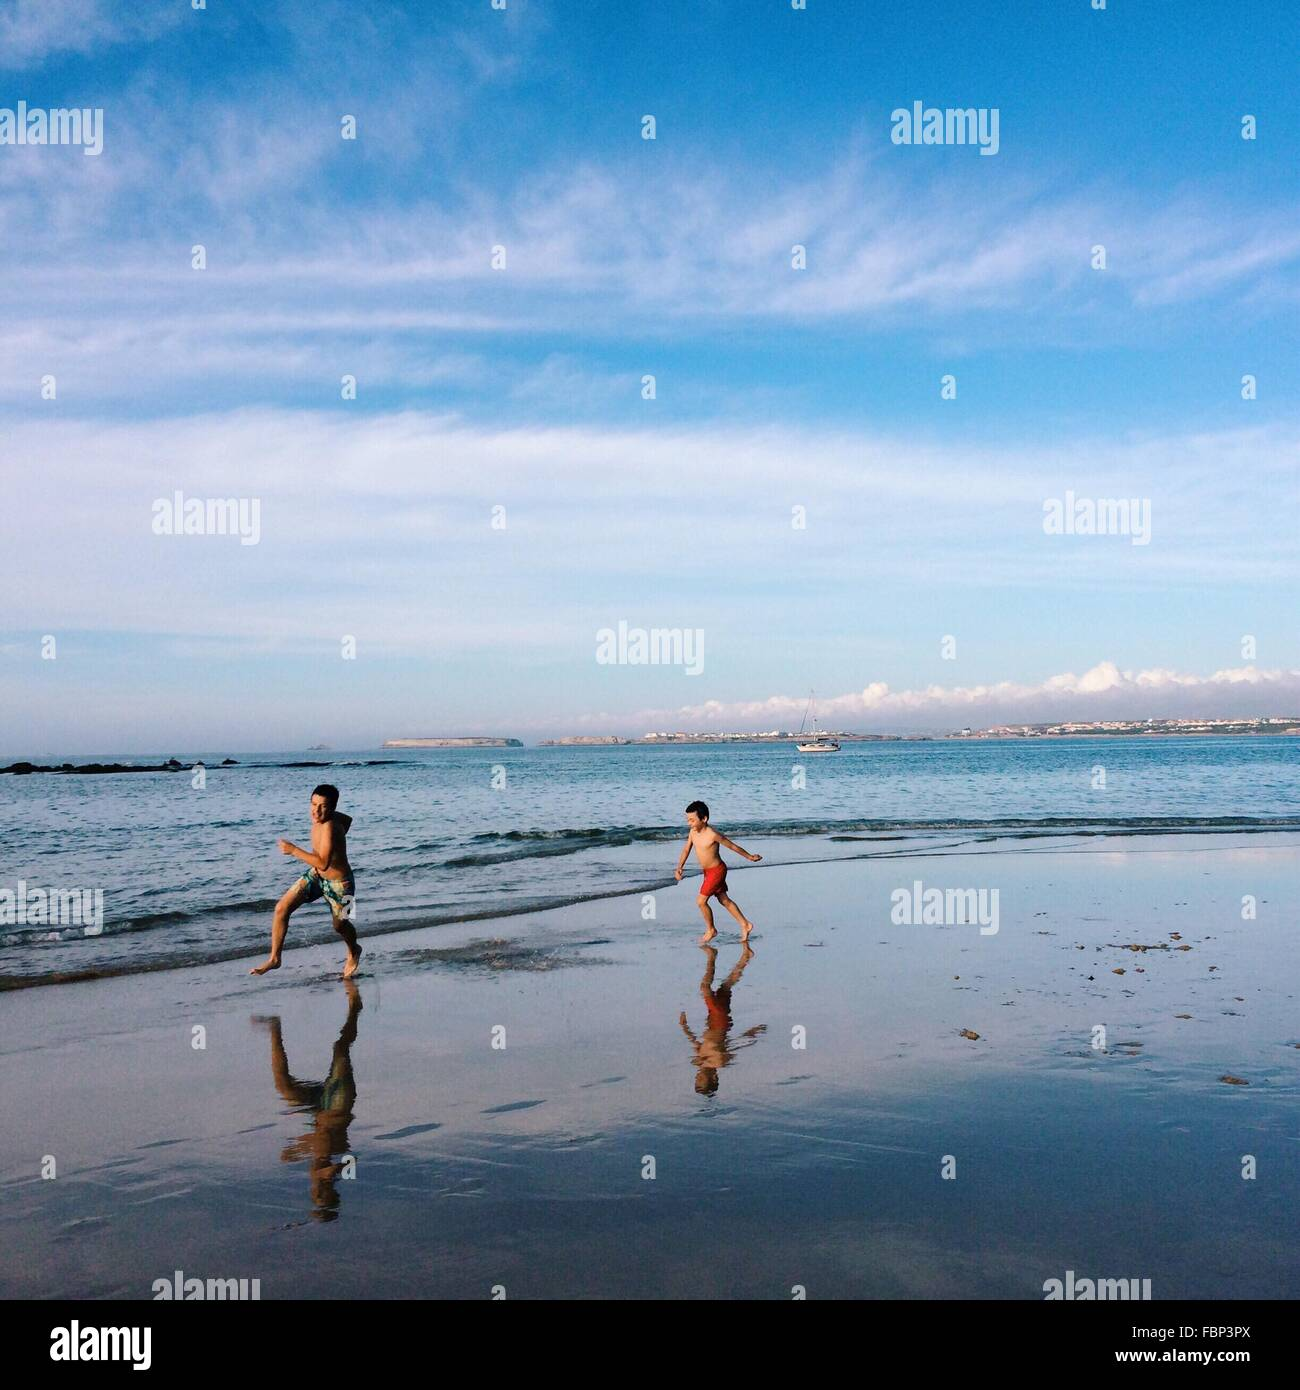 Two Boys Running On Beach - Stock Image